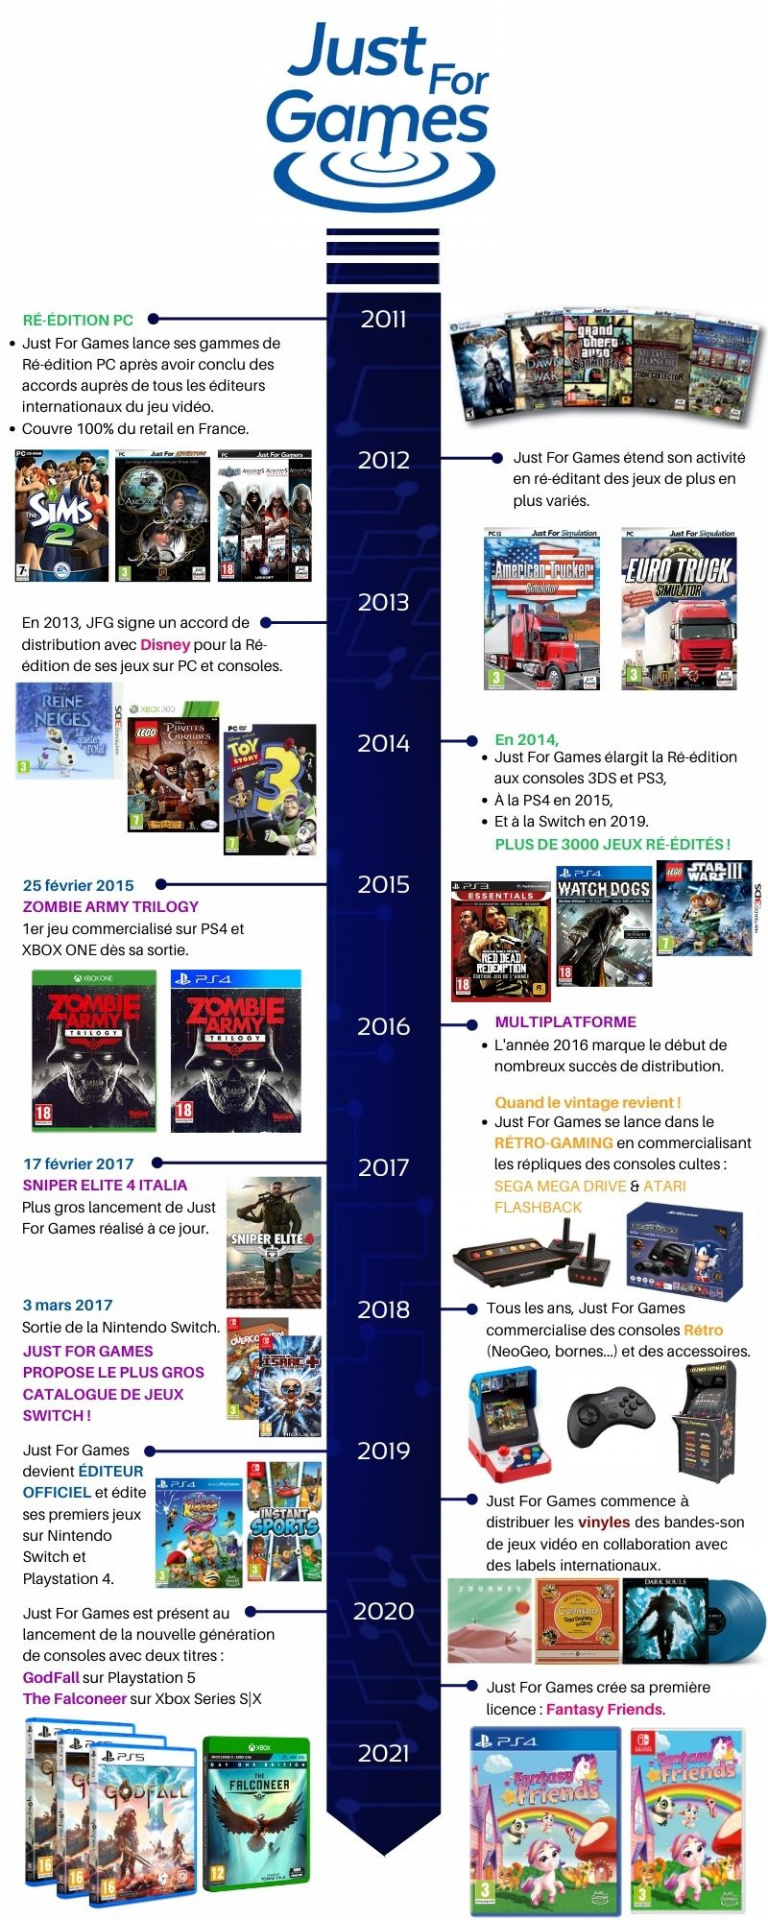 PS5 - Just For Games s'offre une console à son image